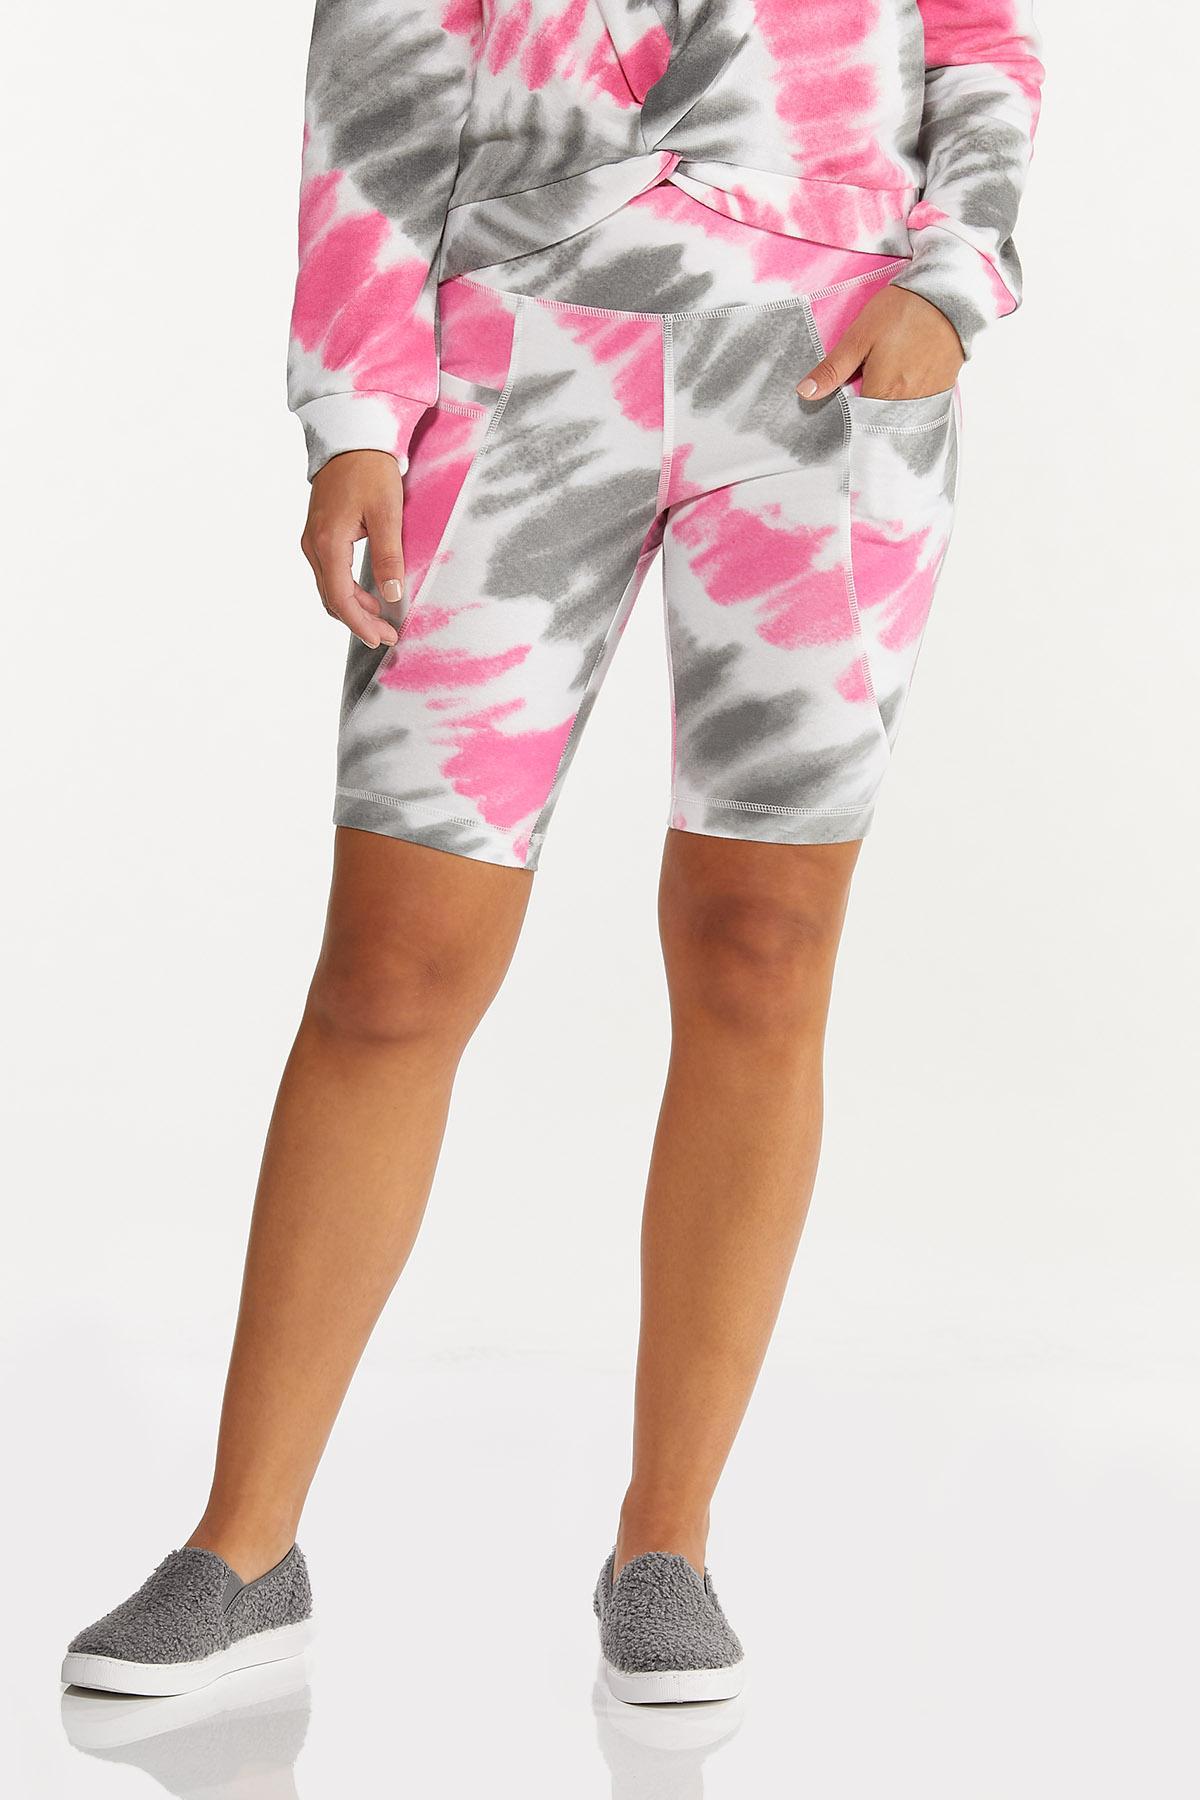 Pink Tie Dye Biker Shorts (Item #44661922)